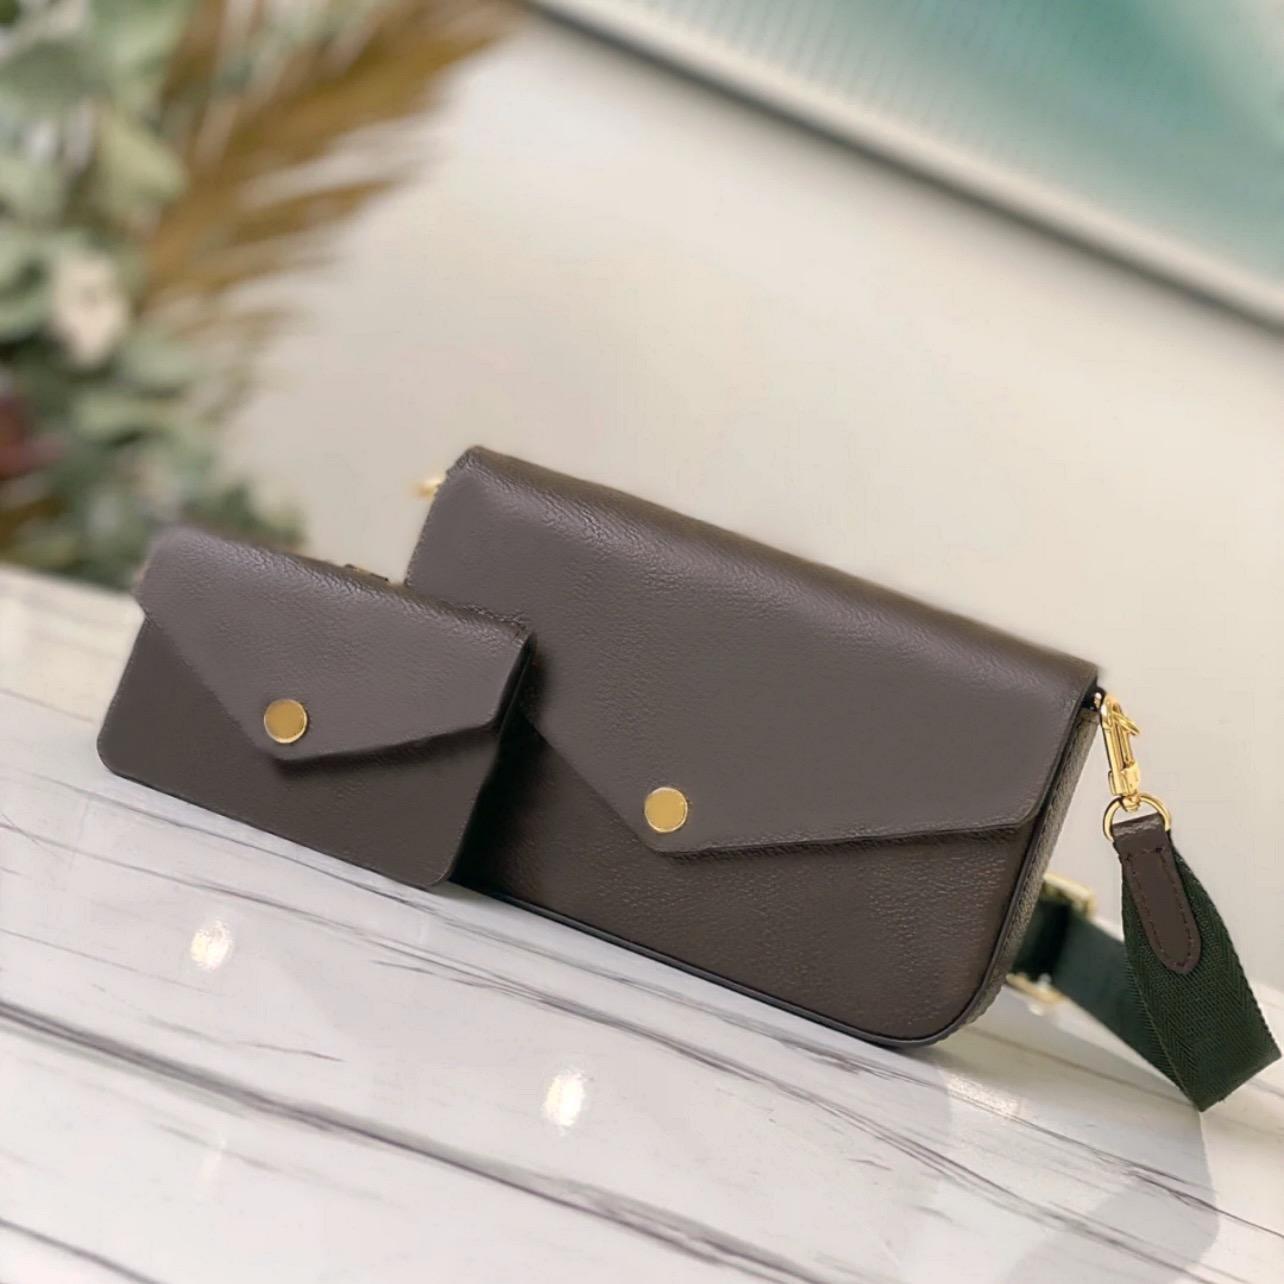 Twin set shoulder bag women Handbag Evening Bags lady fashion chain purse lady shoulder bag handbag messenger bag card holder chain purse